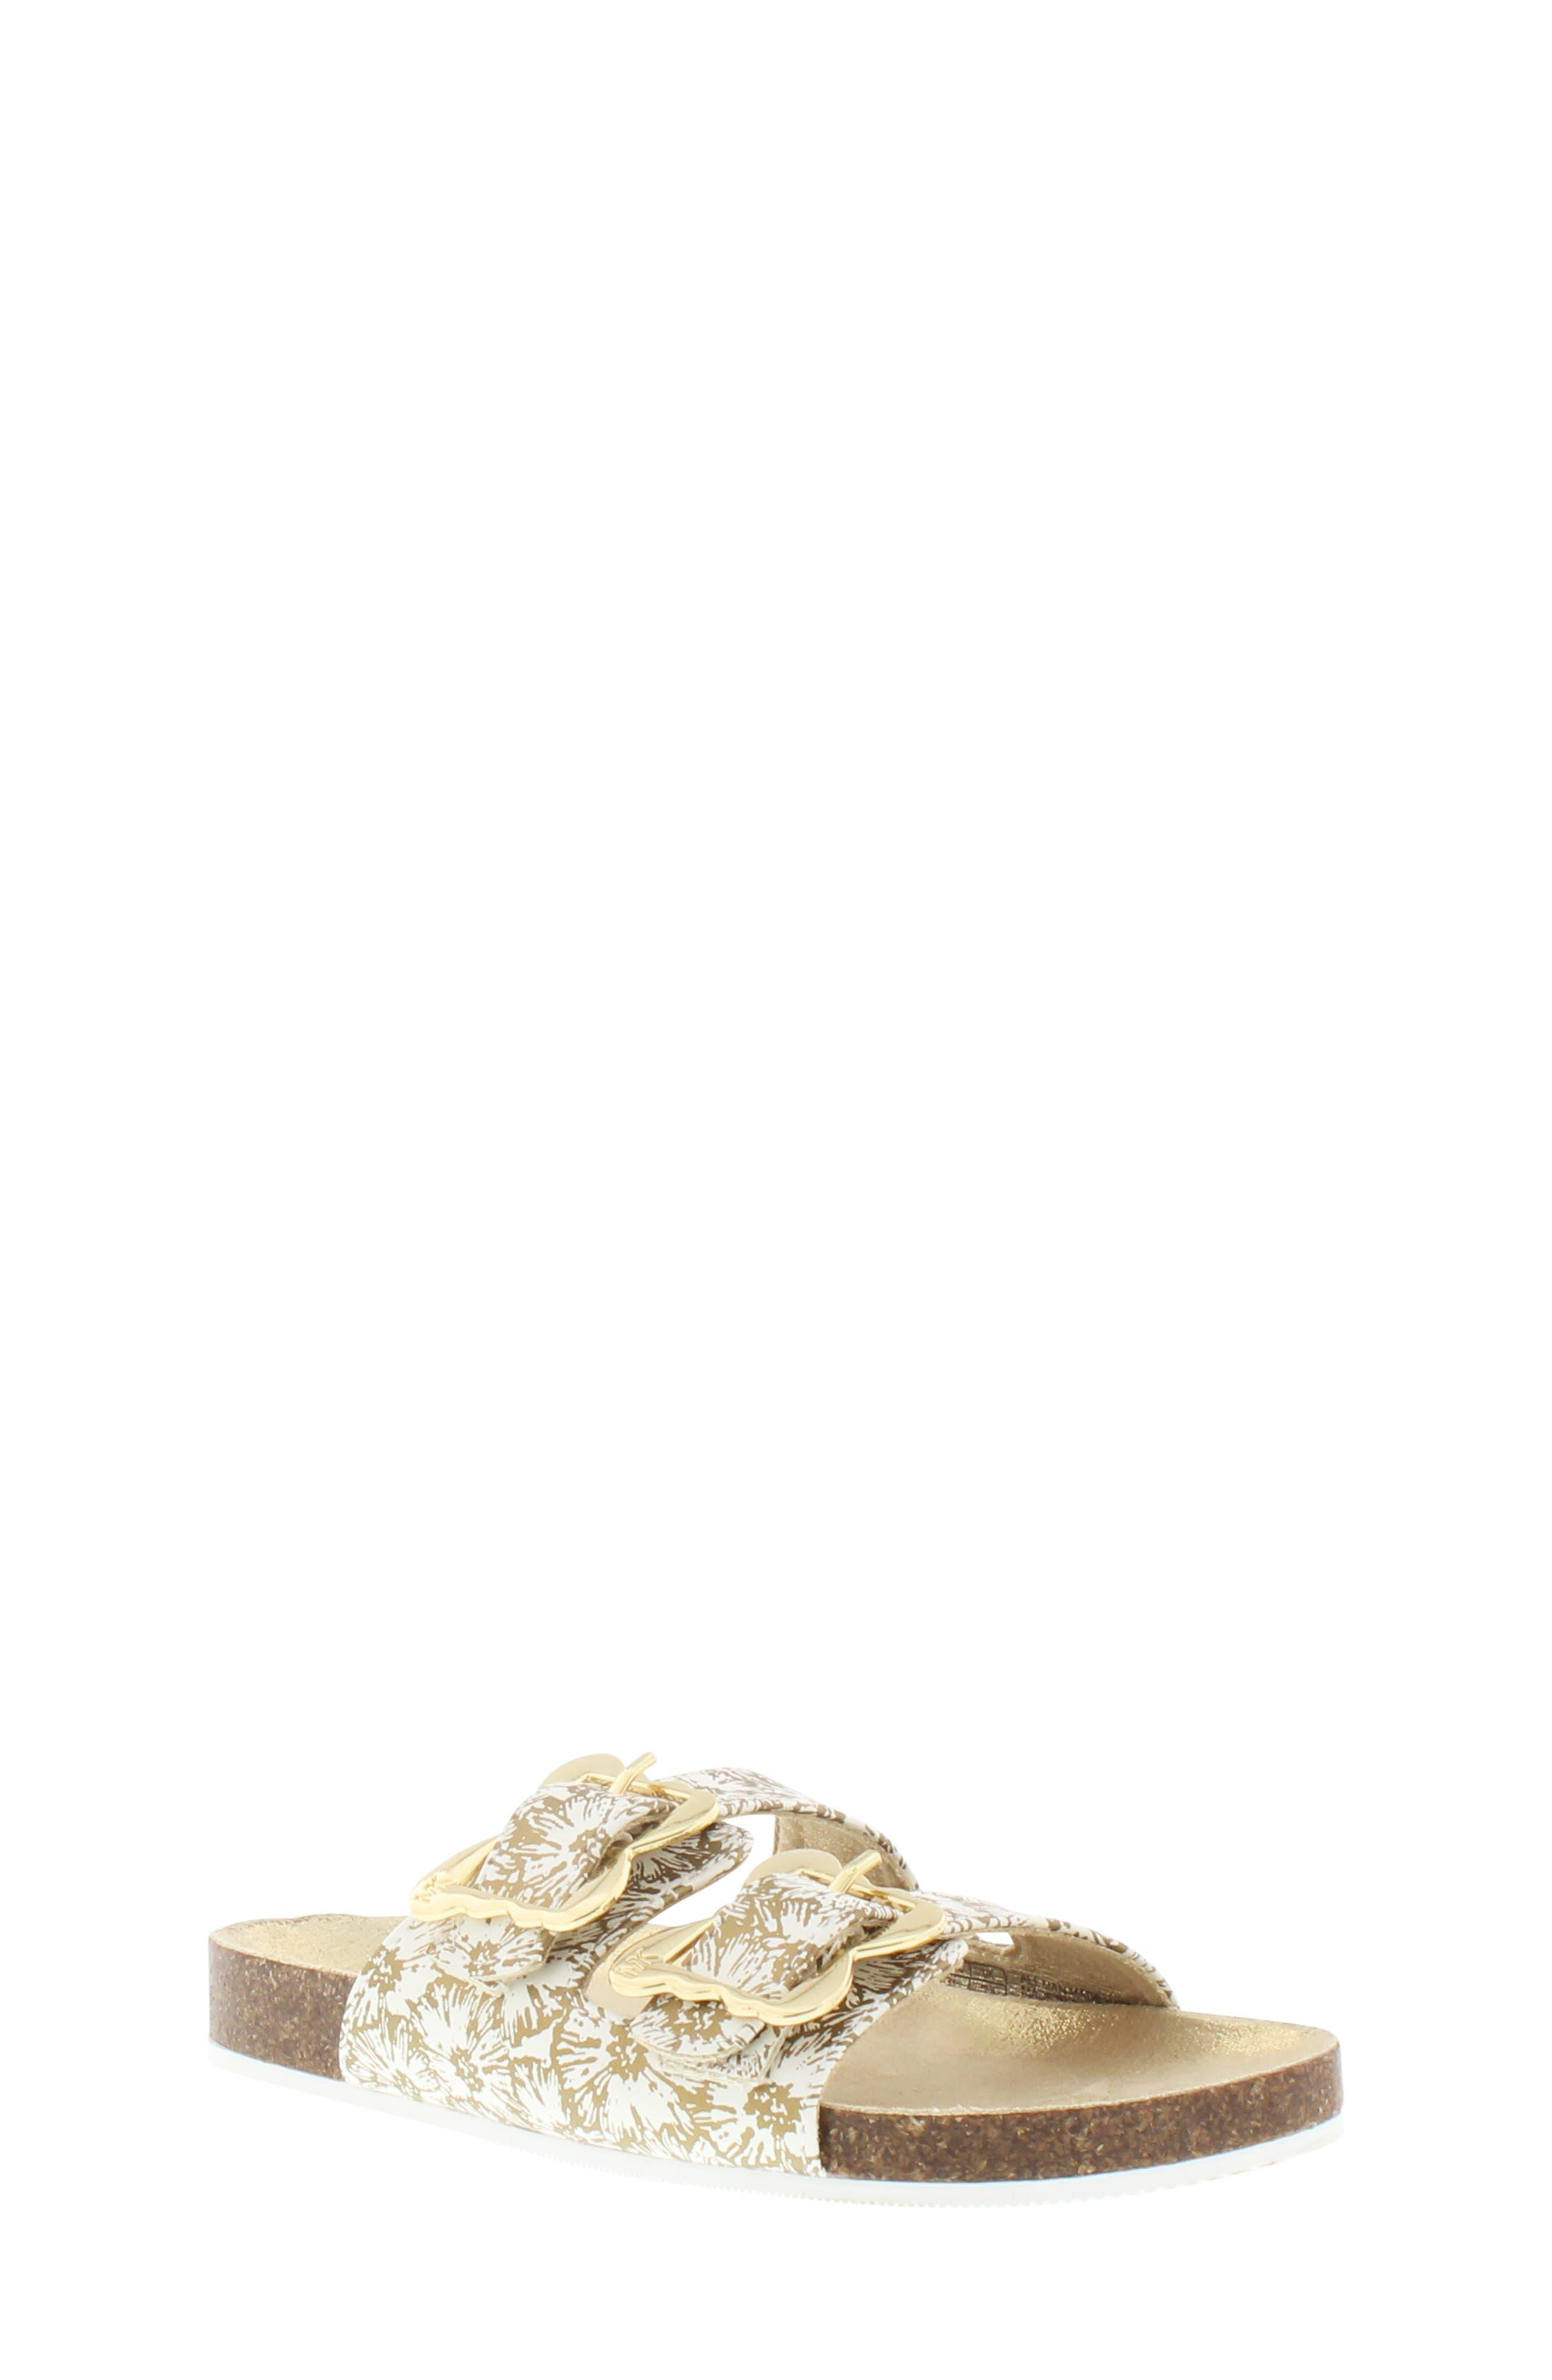 faa87b2f3e70 MICHAEL Michael Kors Girls  Metallic Shoes